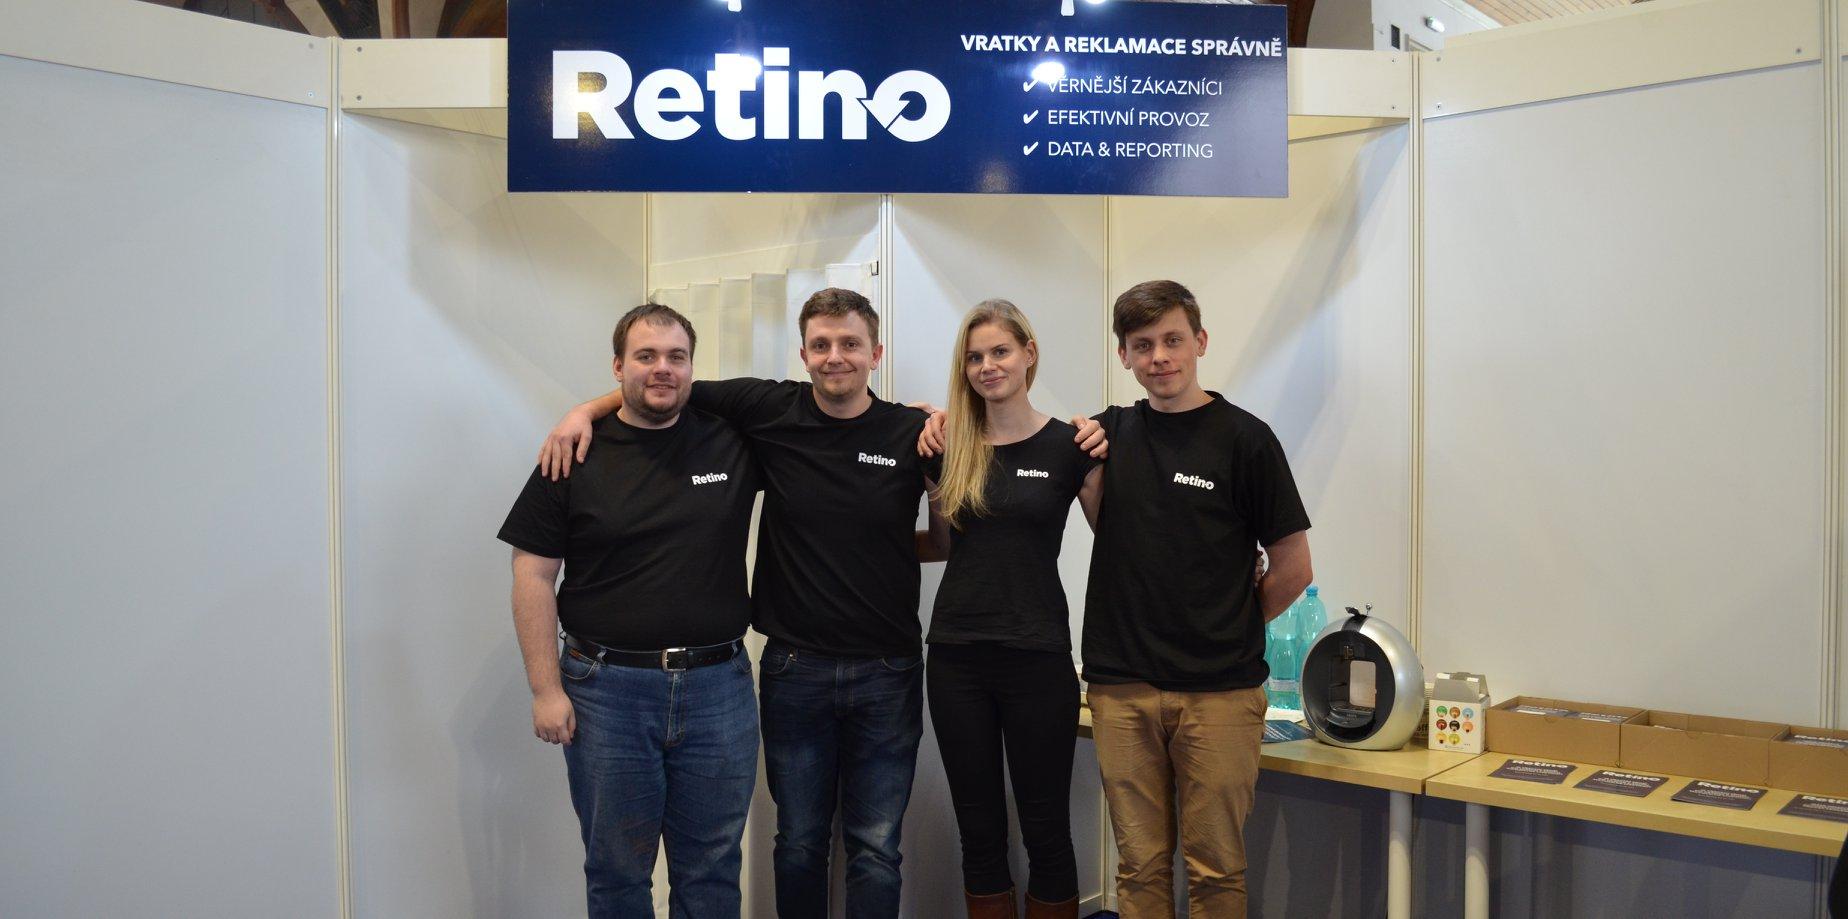 Český startup Retino, vlevo zakladatel Petr Boroš